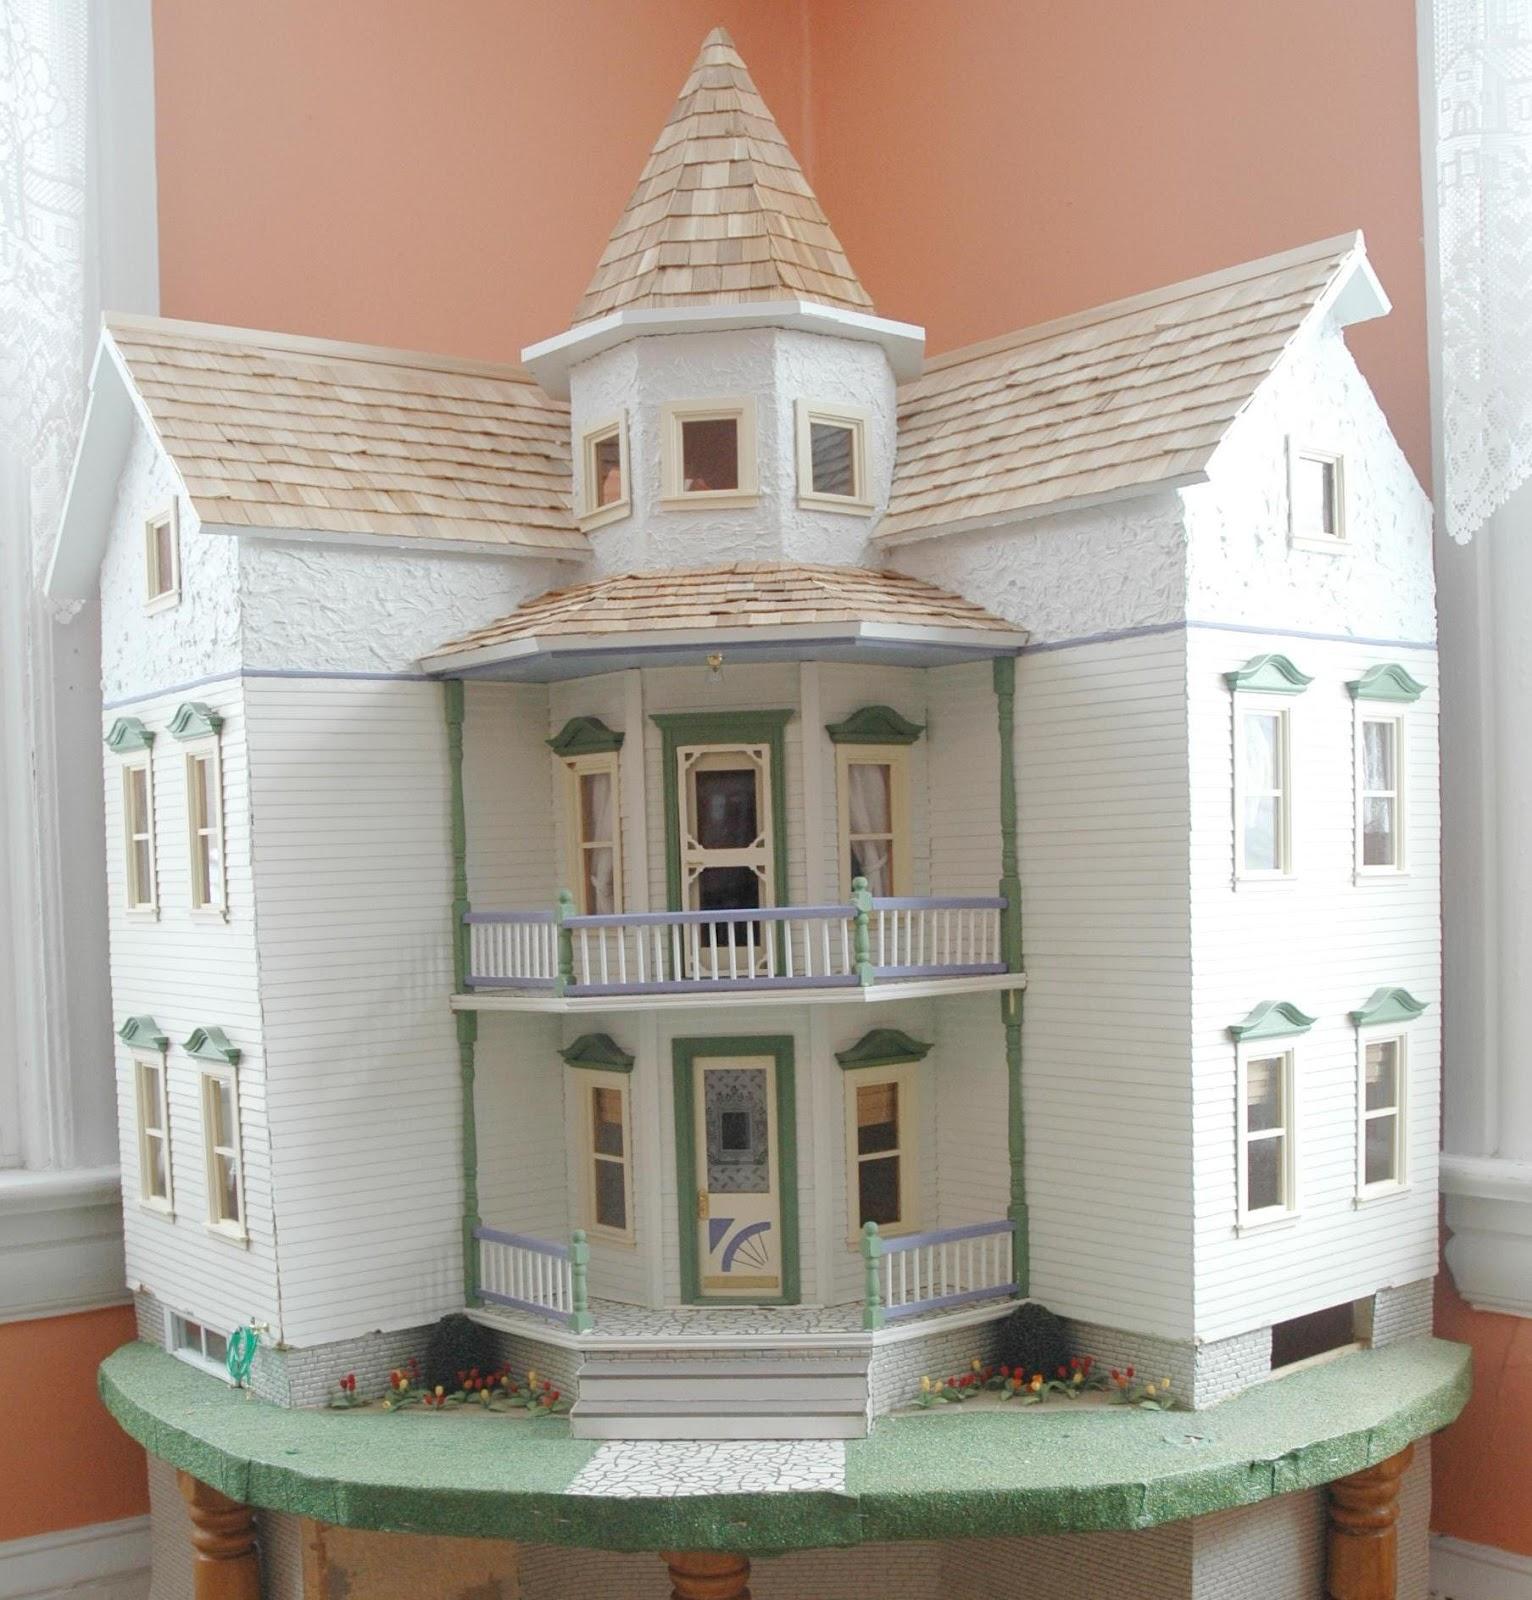 Honey, I Shrunk The House!: Sea Side Villa